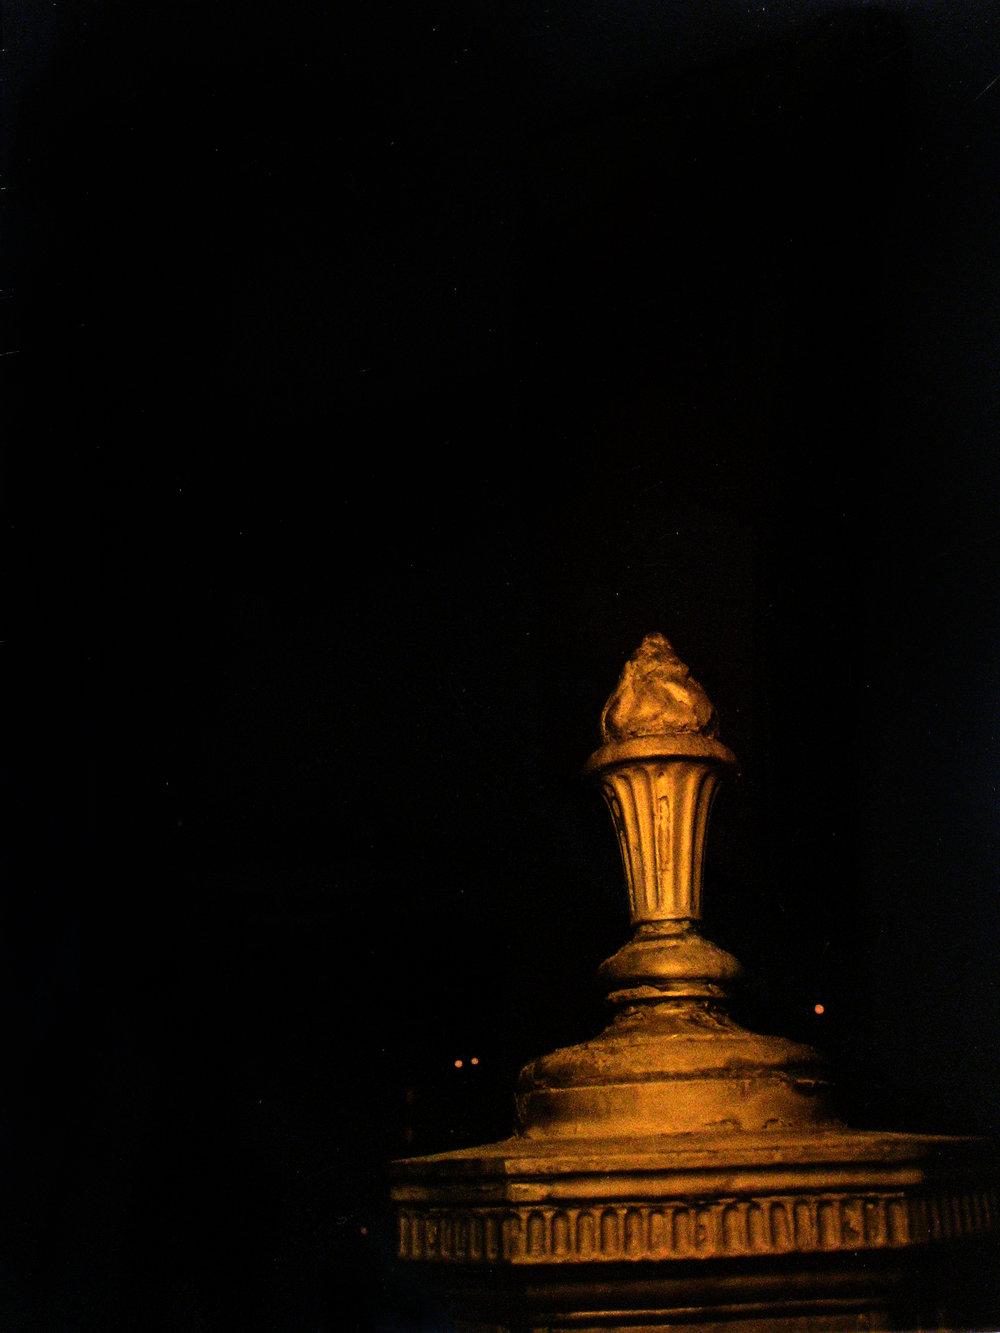 "Carl Goldhagen(BIO), Call Box, 1996, photo emulsion on gold plated copper 1/5, 14"" x 11"""